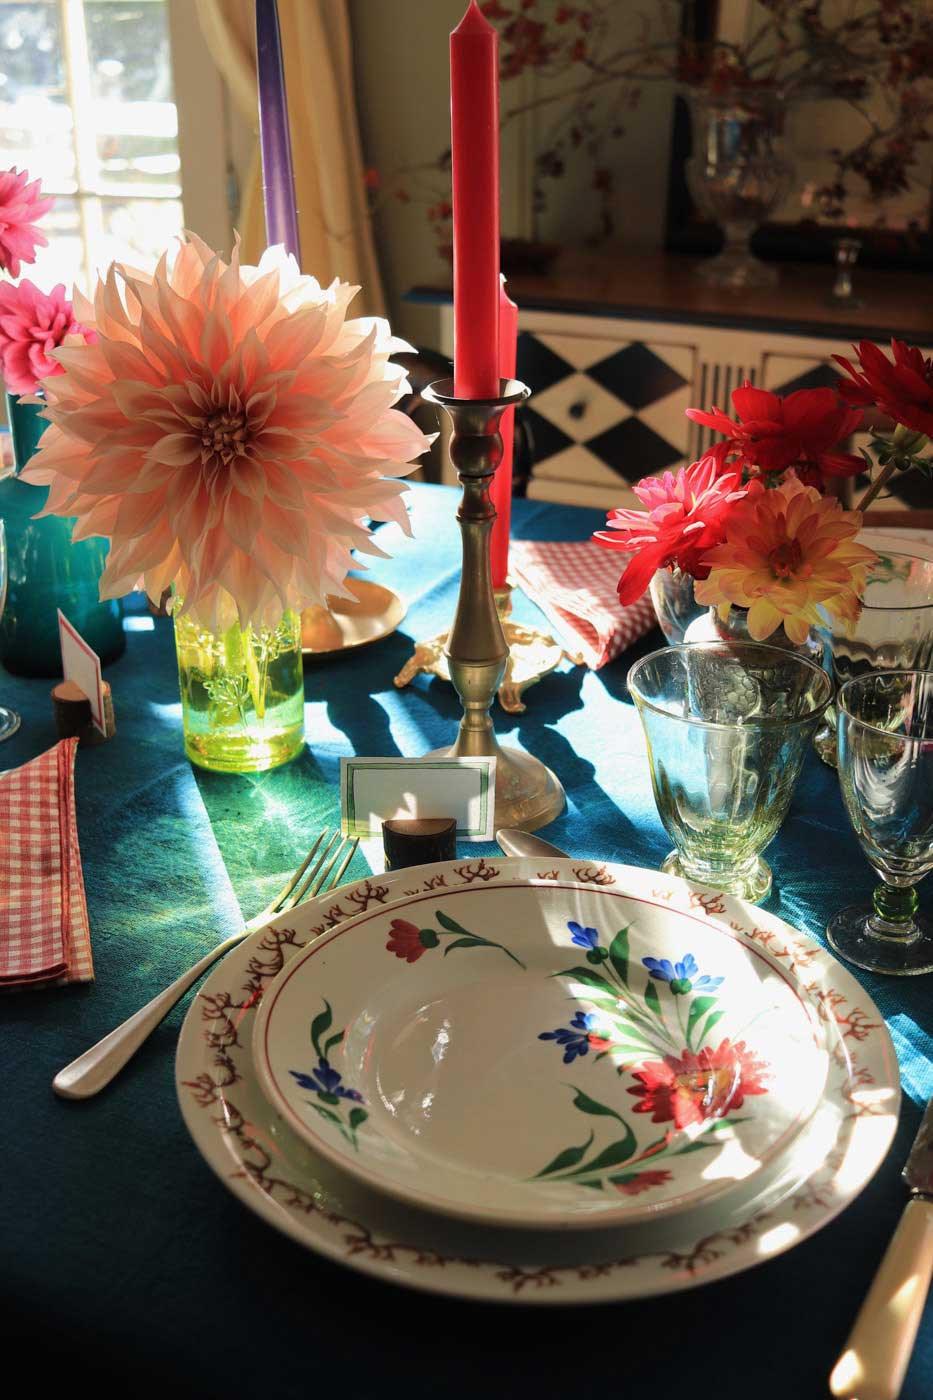 dresser-table-art-dahlias-tablescape-how-to-set-table-vt-04